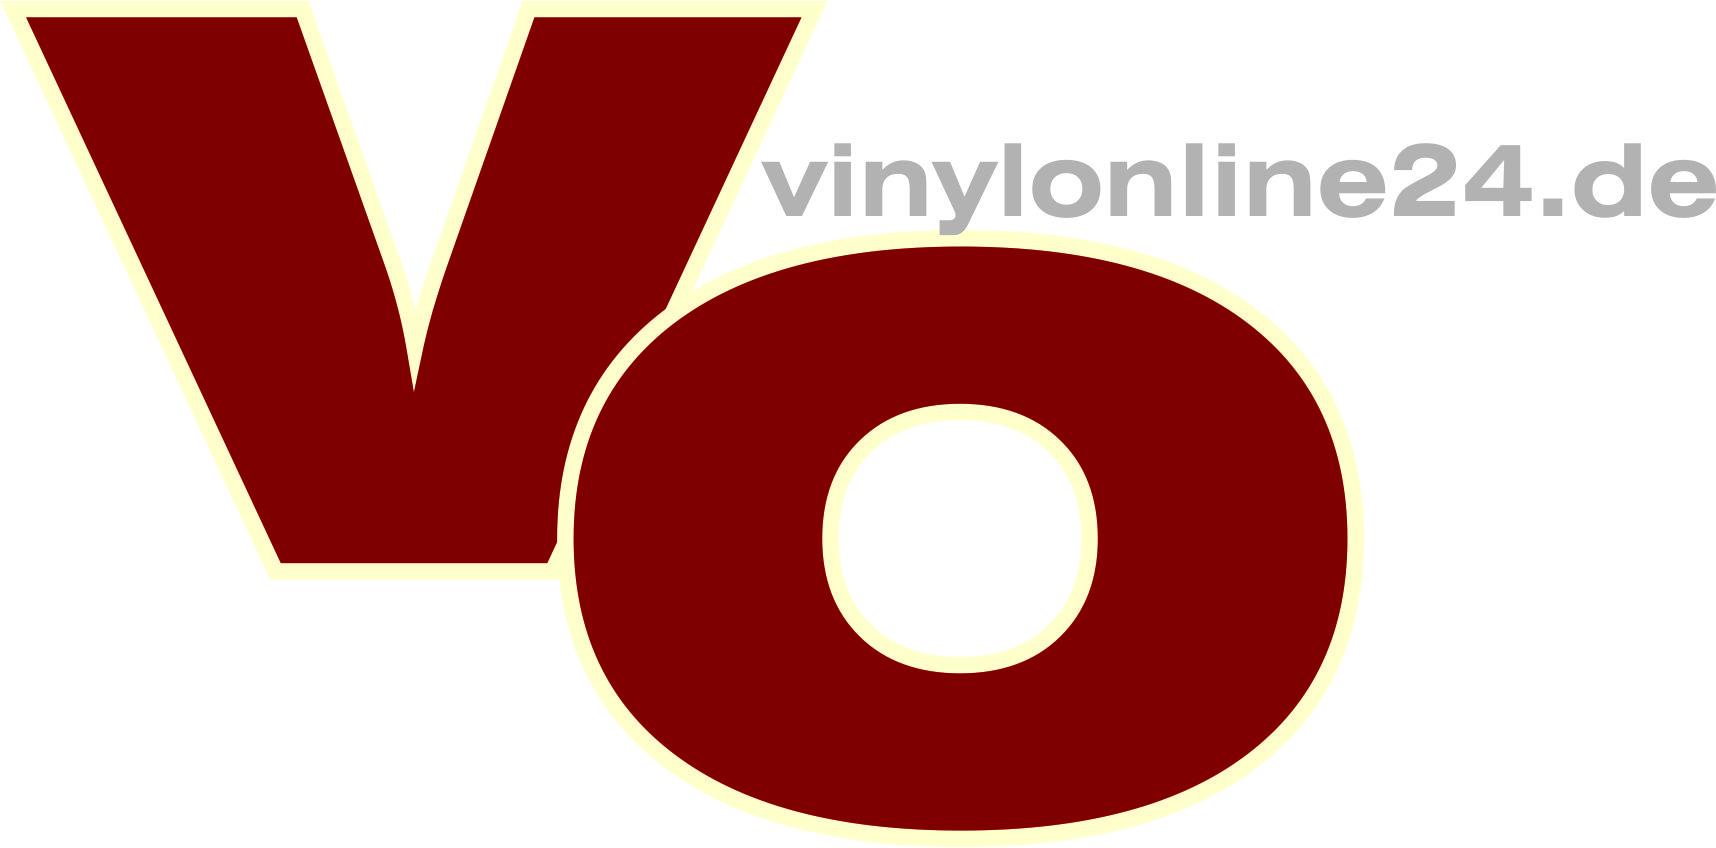 vinylonline24.de-Logo